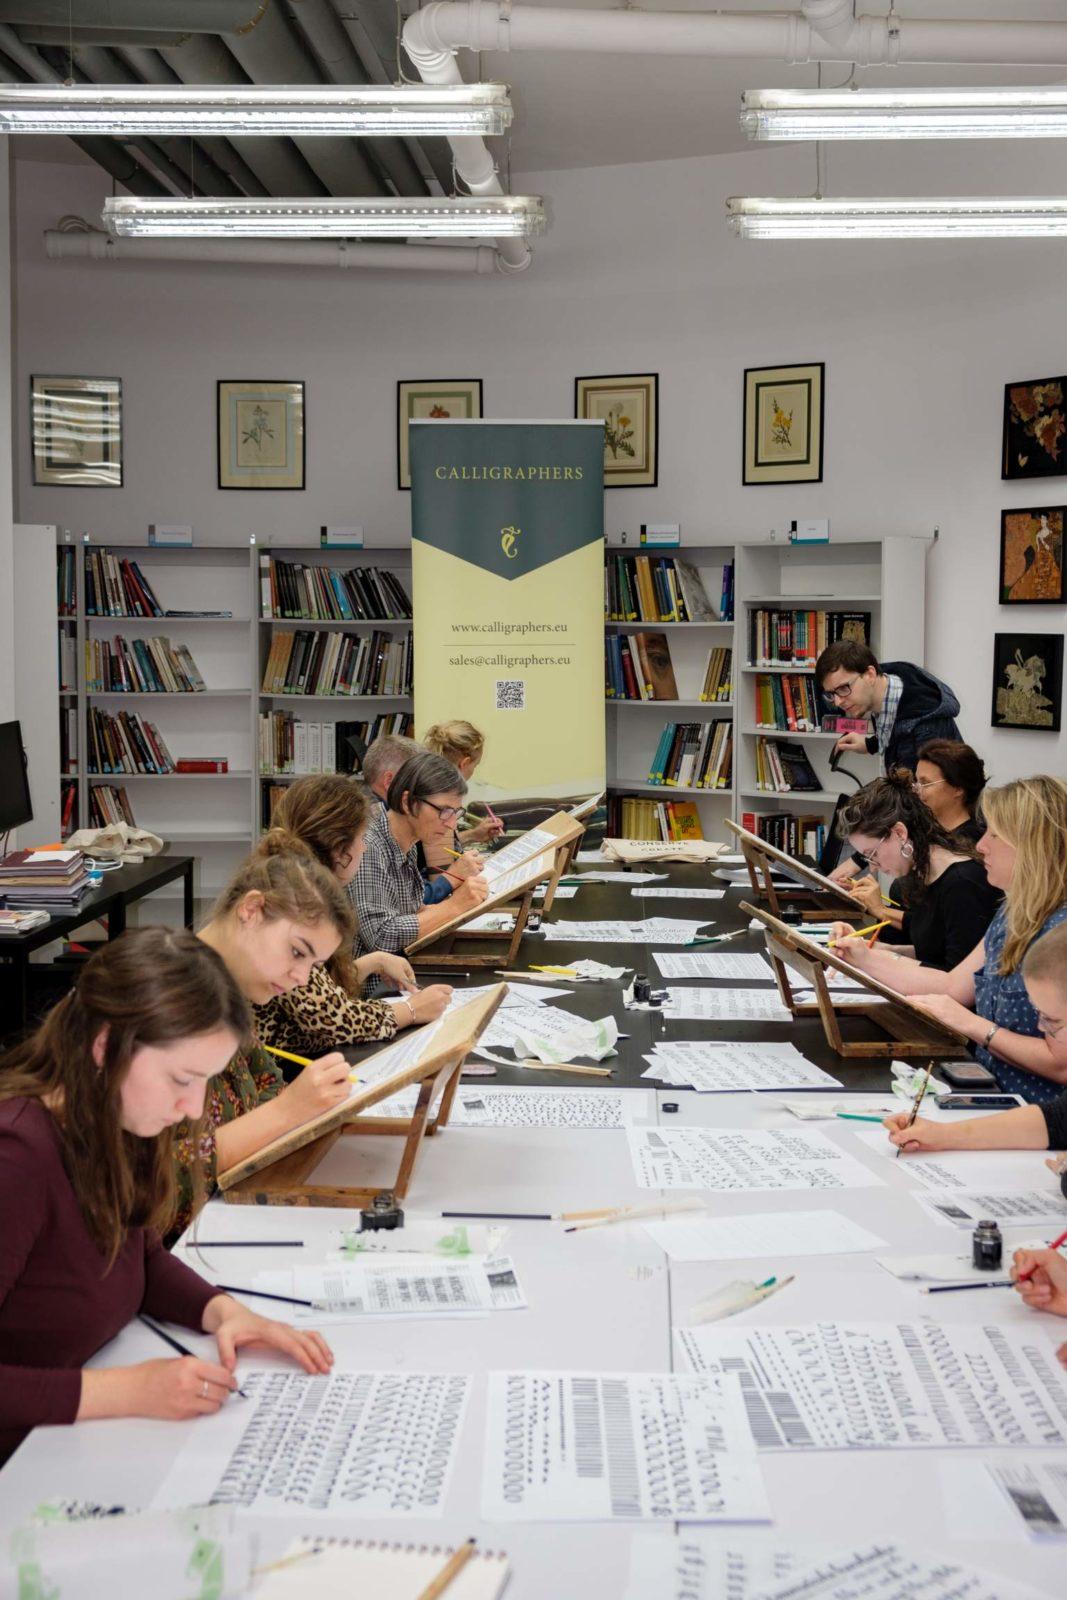 Warschau_2019_Workshop_Calligraphy_IADA_208